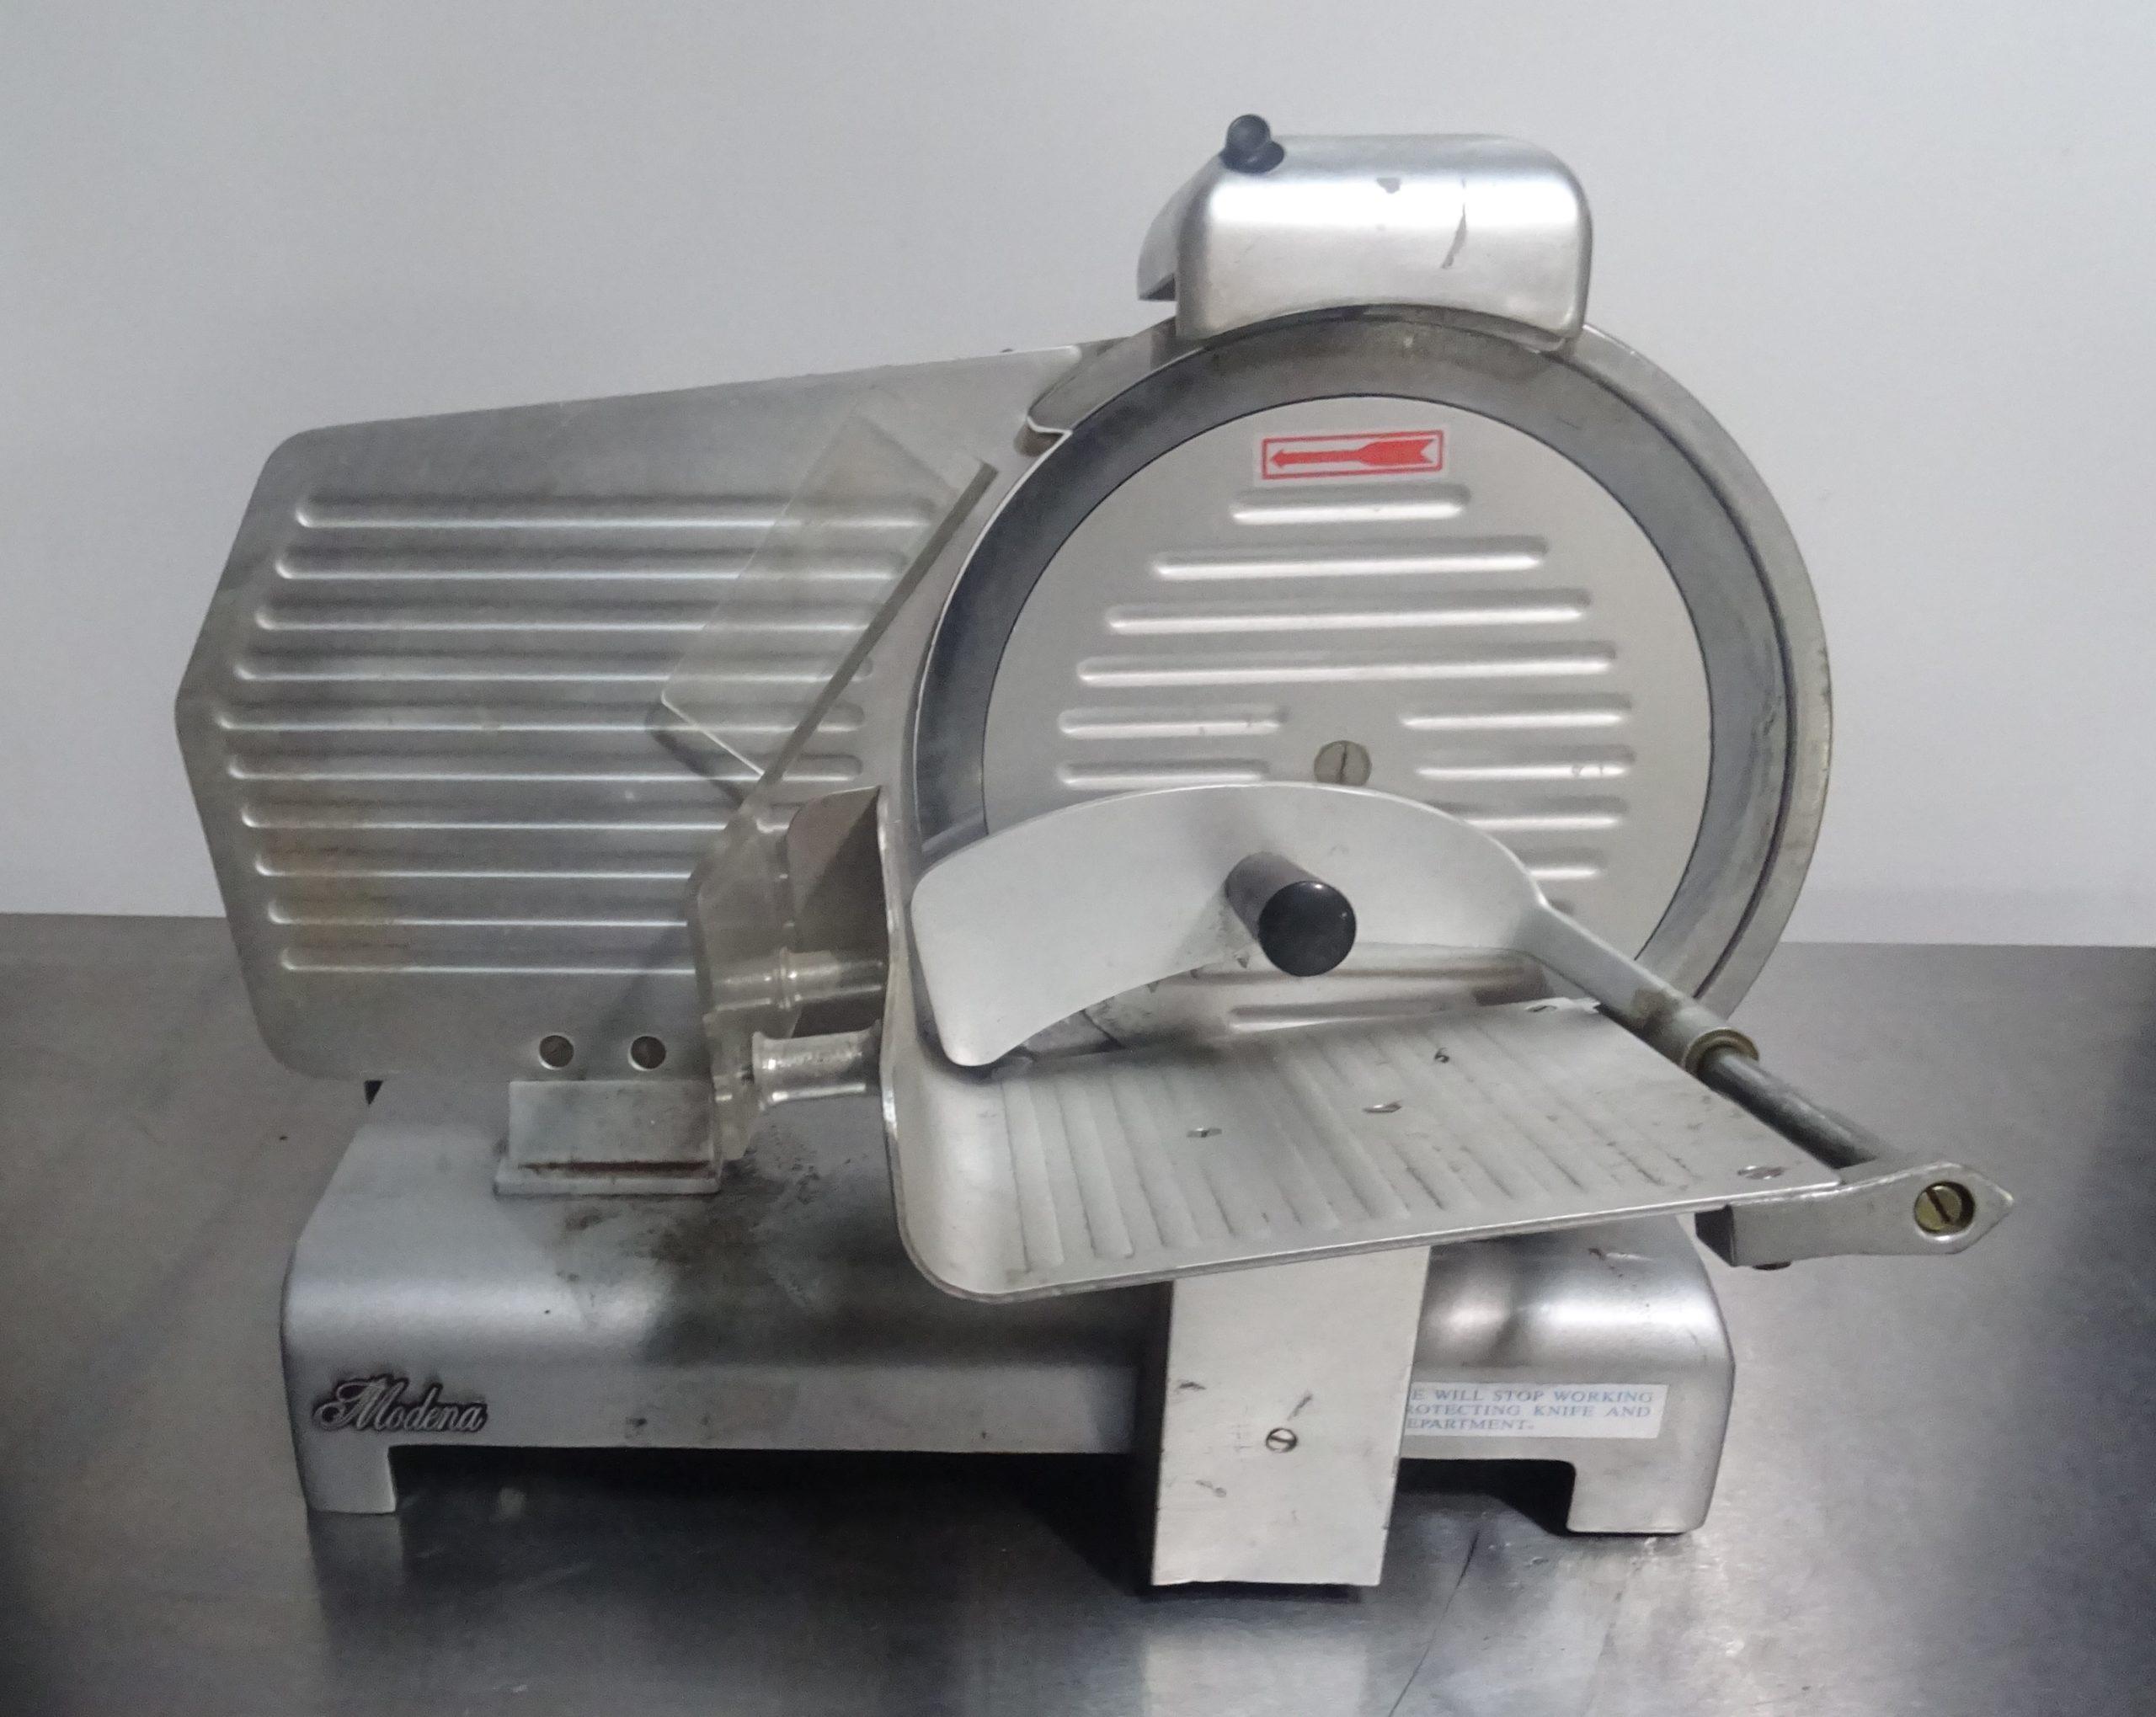 MODENA FPM8 10″ Slicer